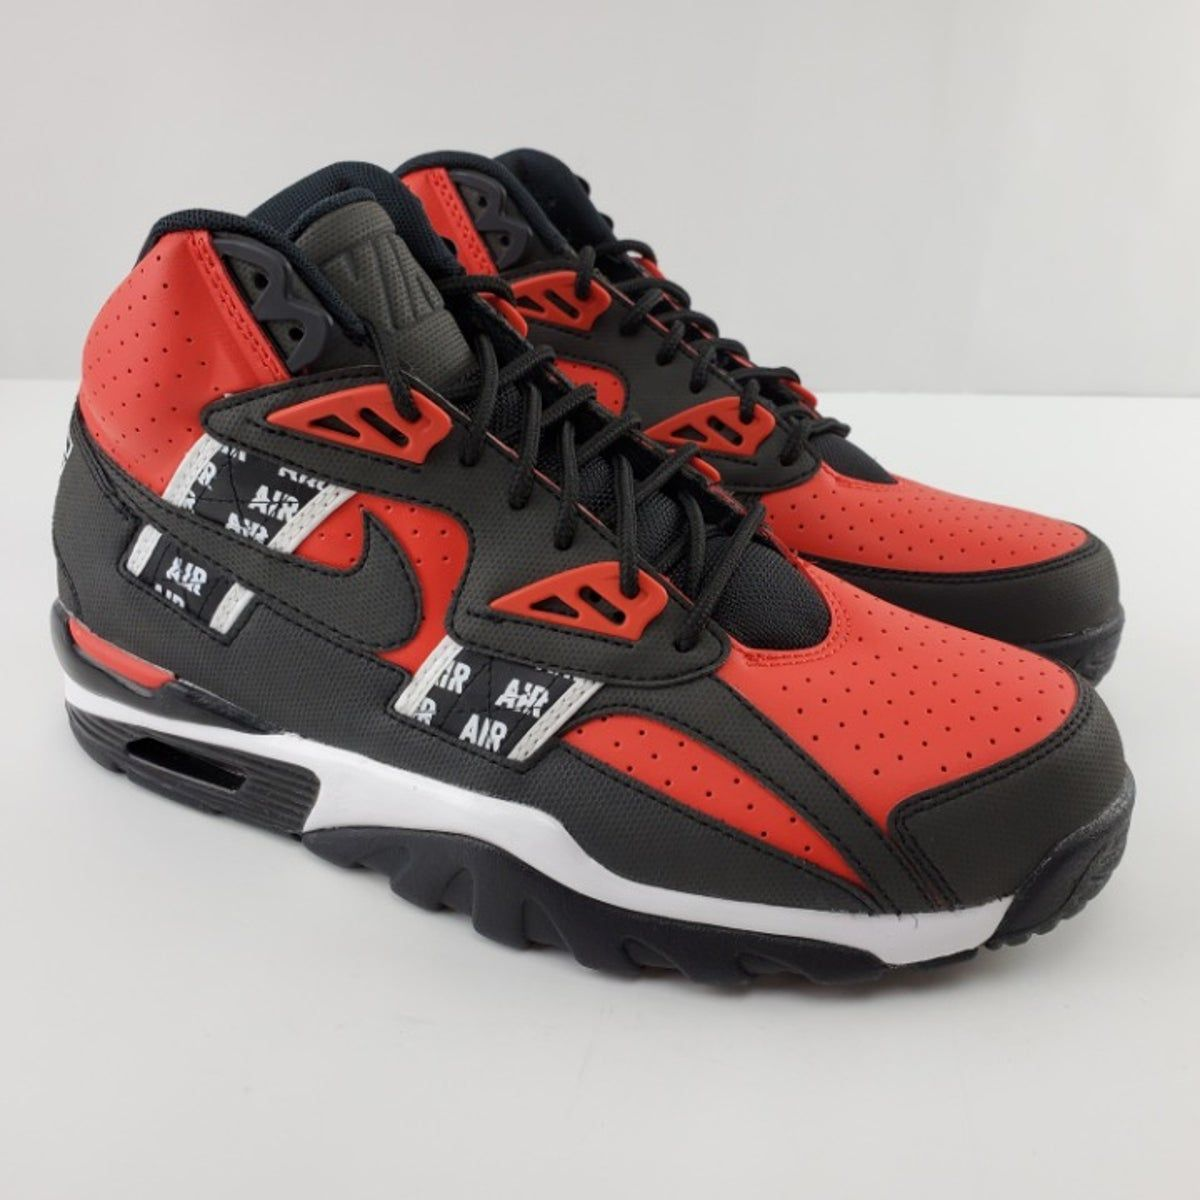 Nike Air Trainer SC HIGH SOA BO JACKSON